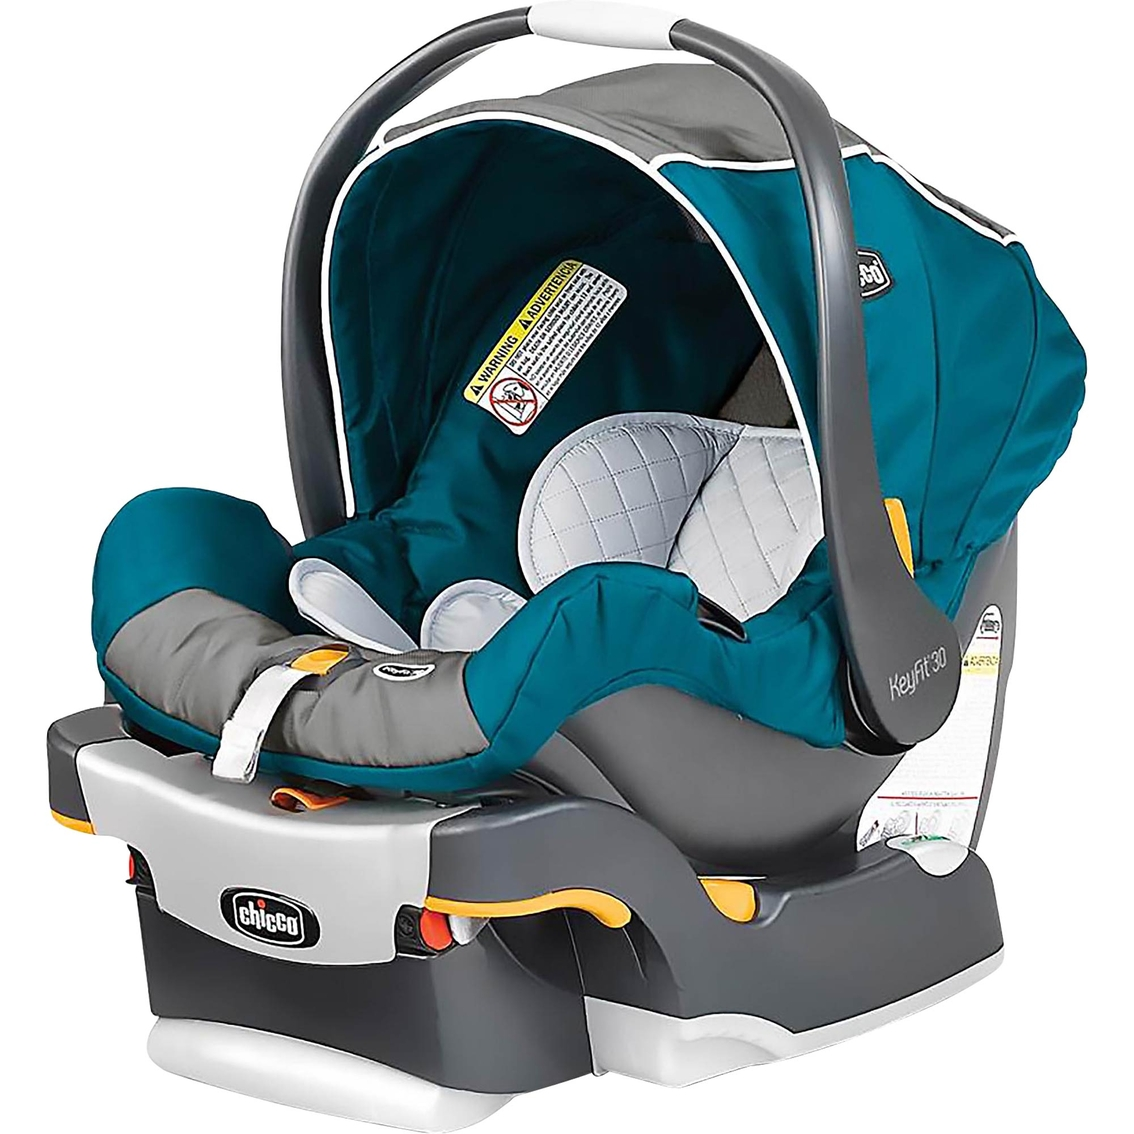 chicco keyfit 30 infant car seat infant seats baby toys shop the exchange. Black Bedroom Furniture Sets. Home Design Ideas